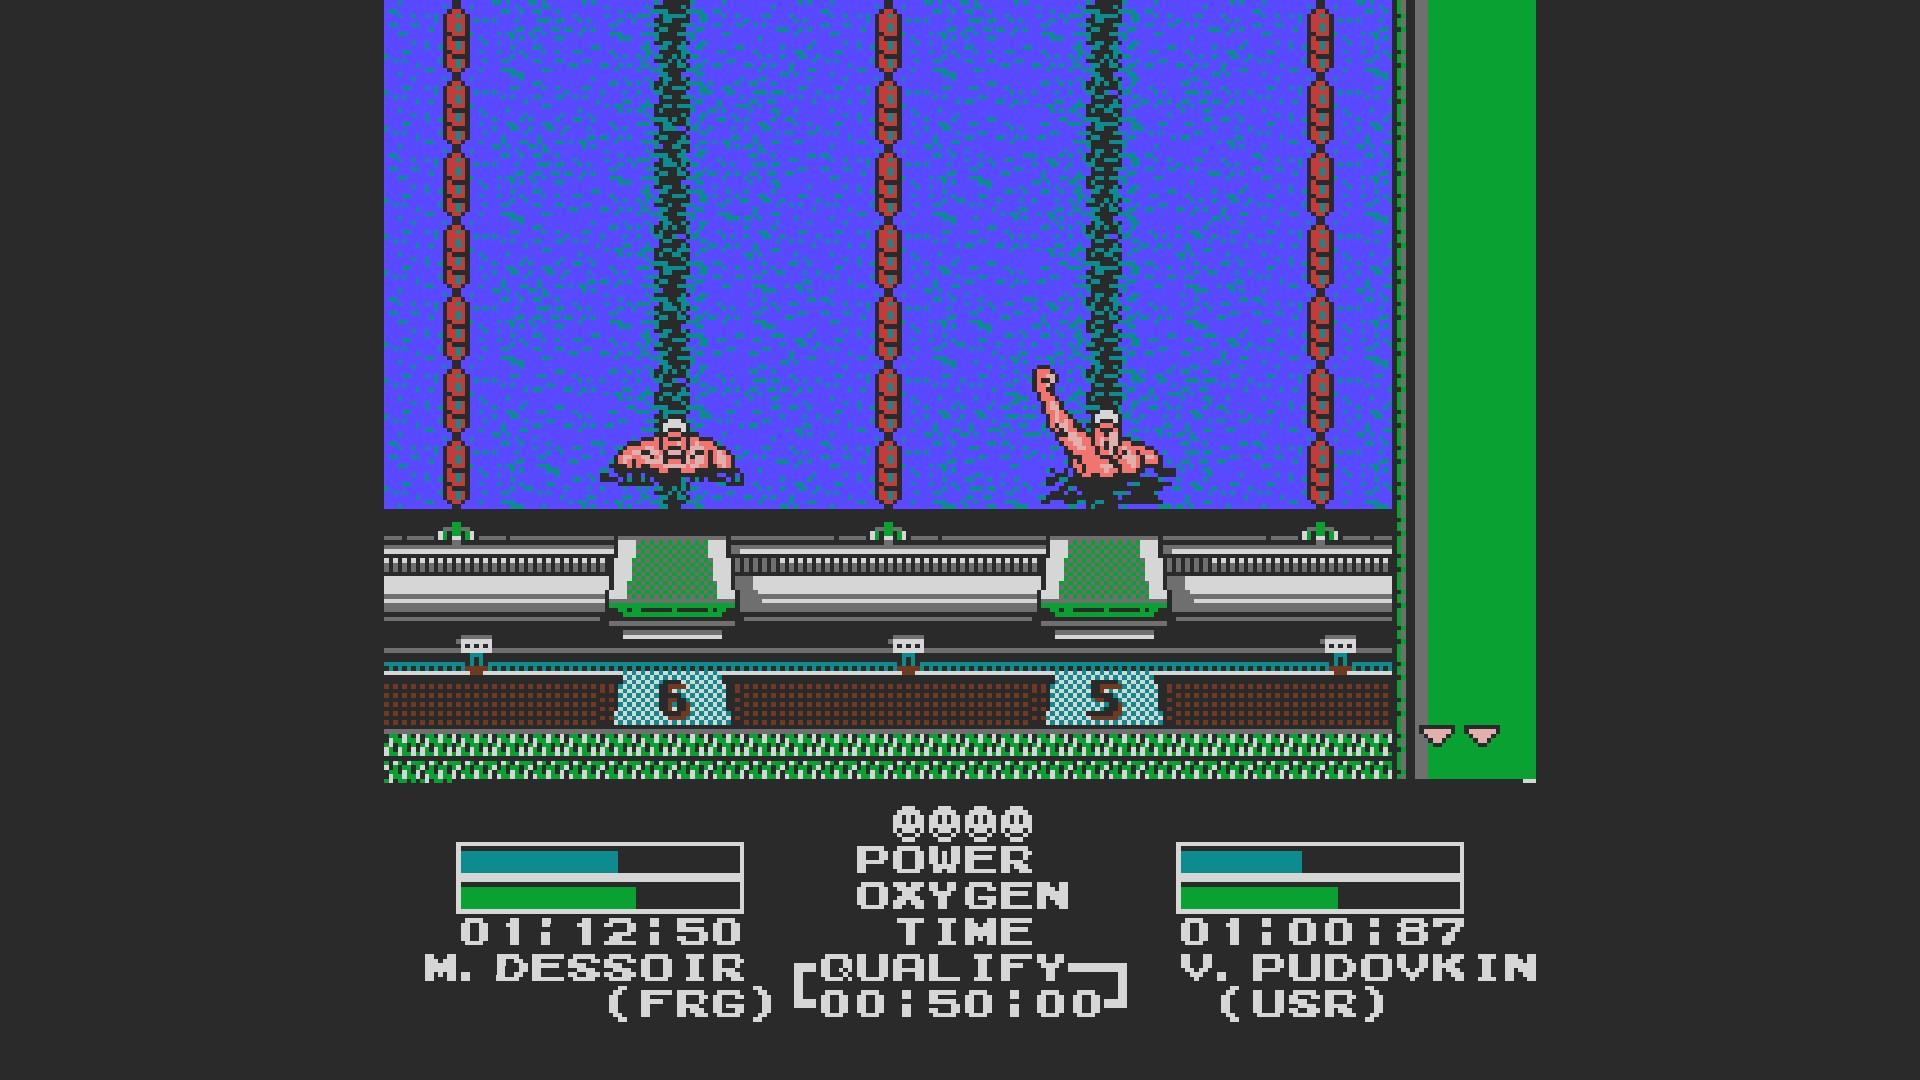 AkinNahtanoj: Track & Field II - Swimming [Olympic Mode] (NES/Famicom Emulated) 0:01:12.5 points on 2020-10-16 03:12:52